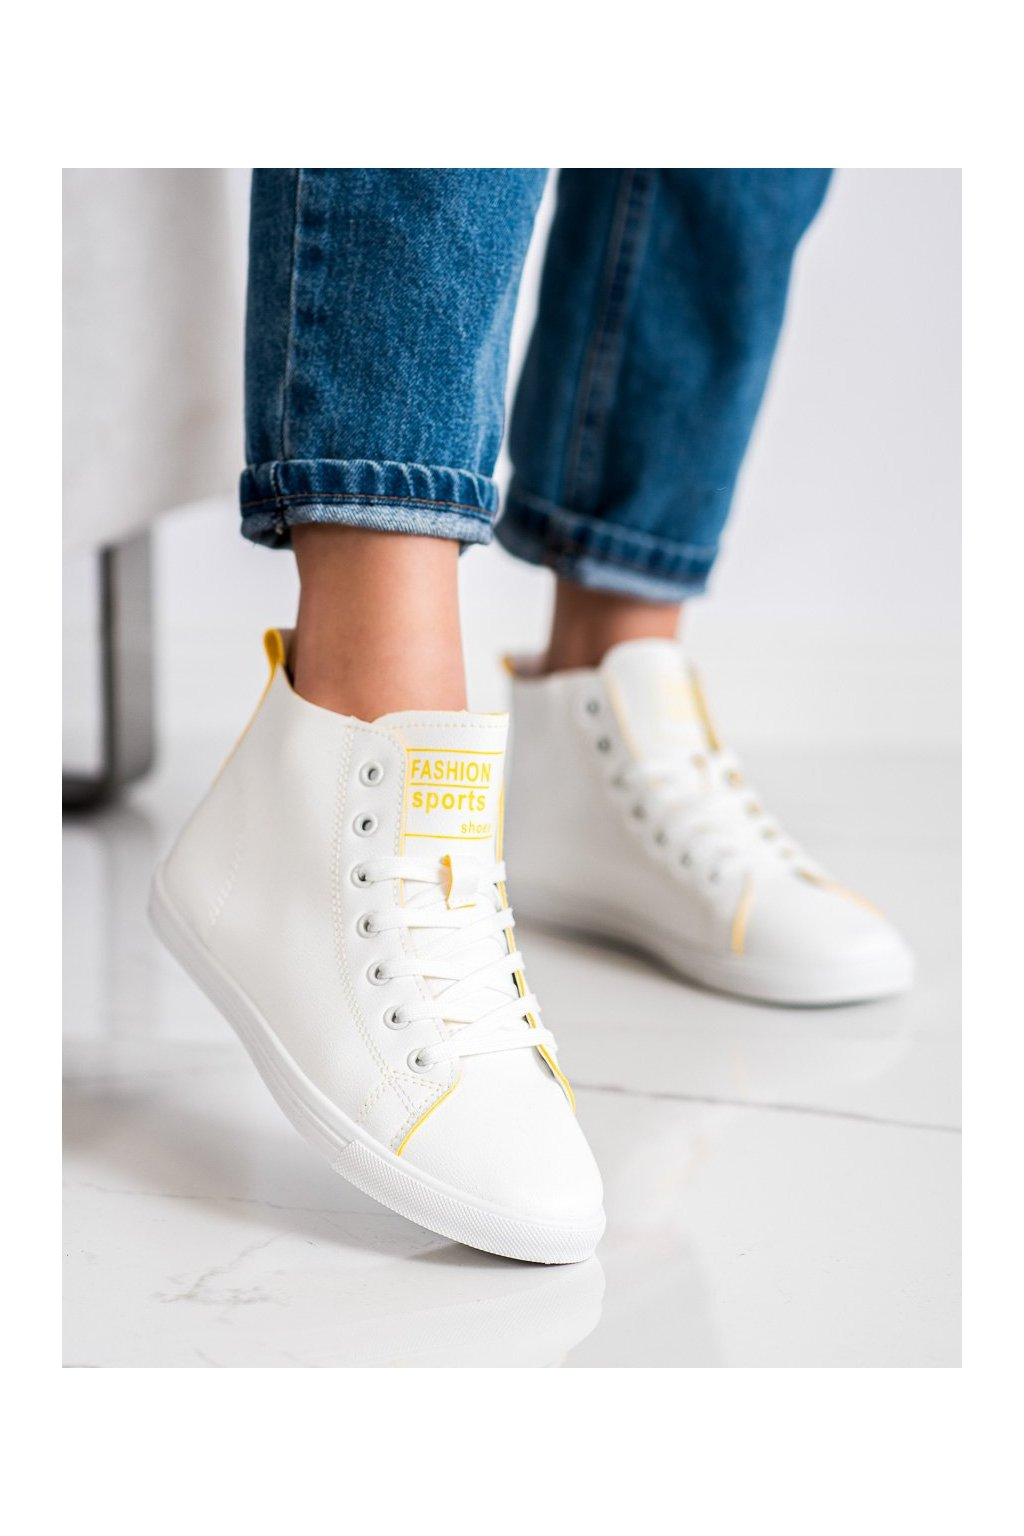 Biele tenisky Ideal shoes kod LX-9858W/Y